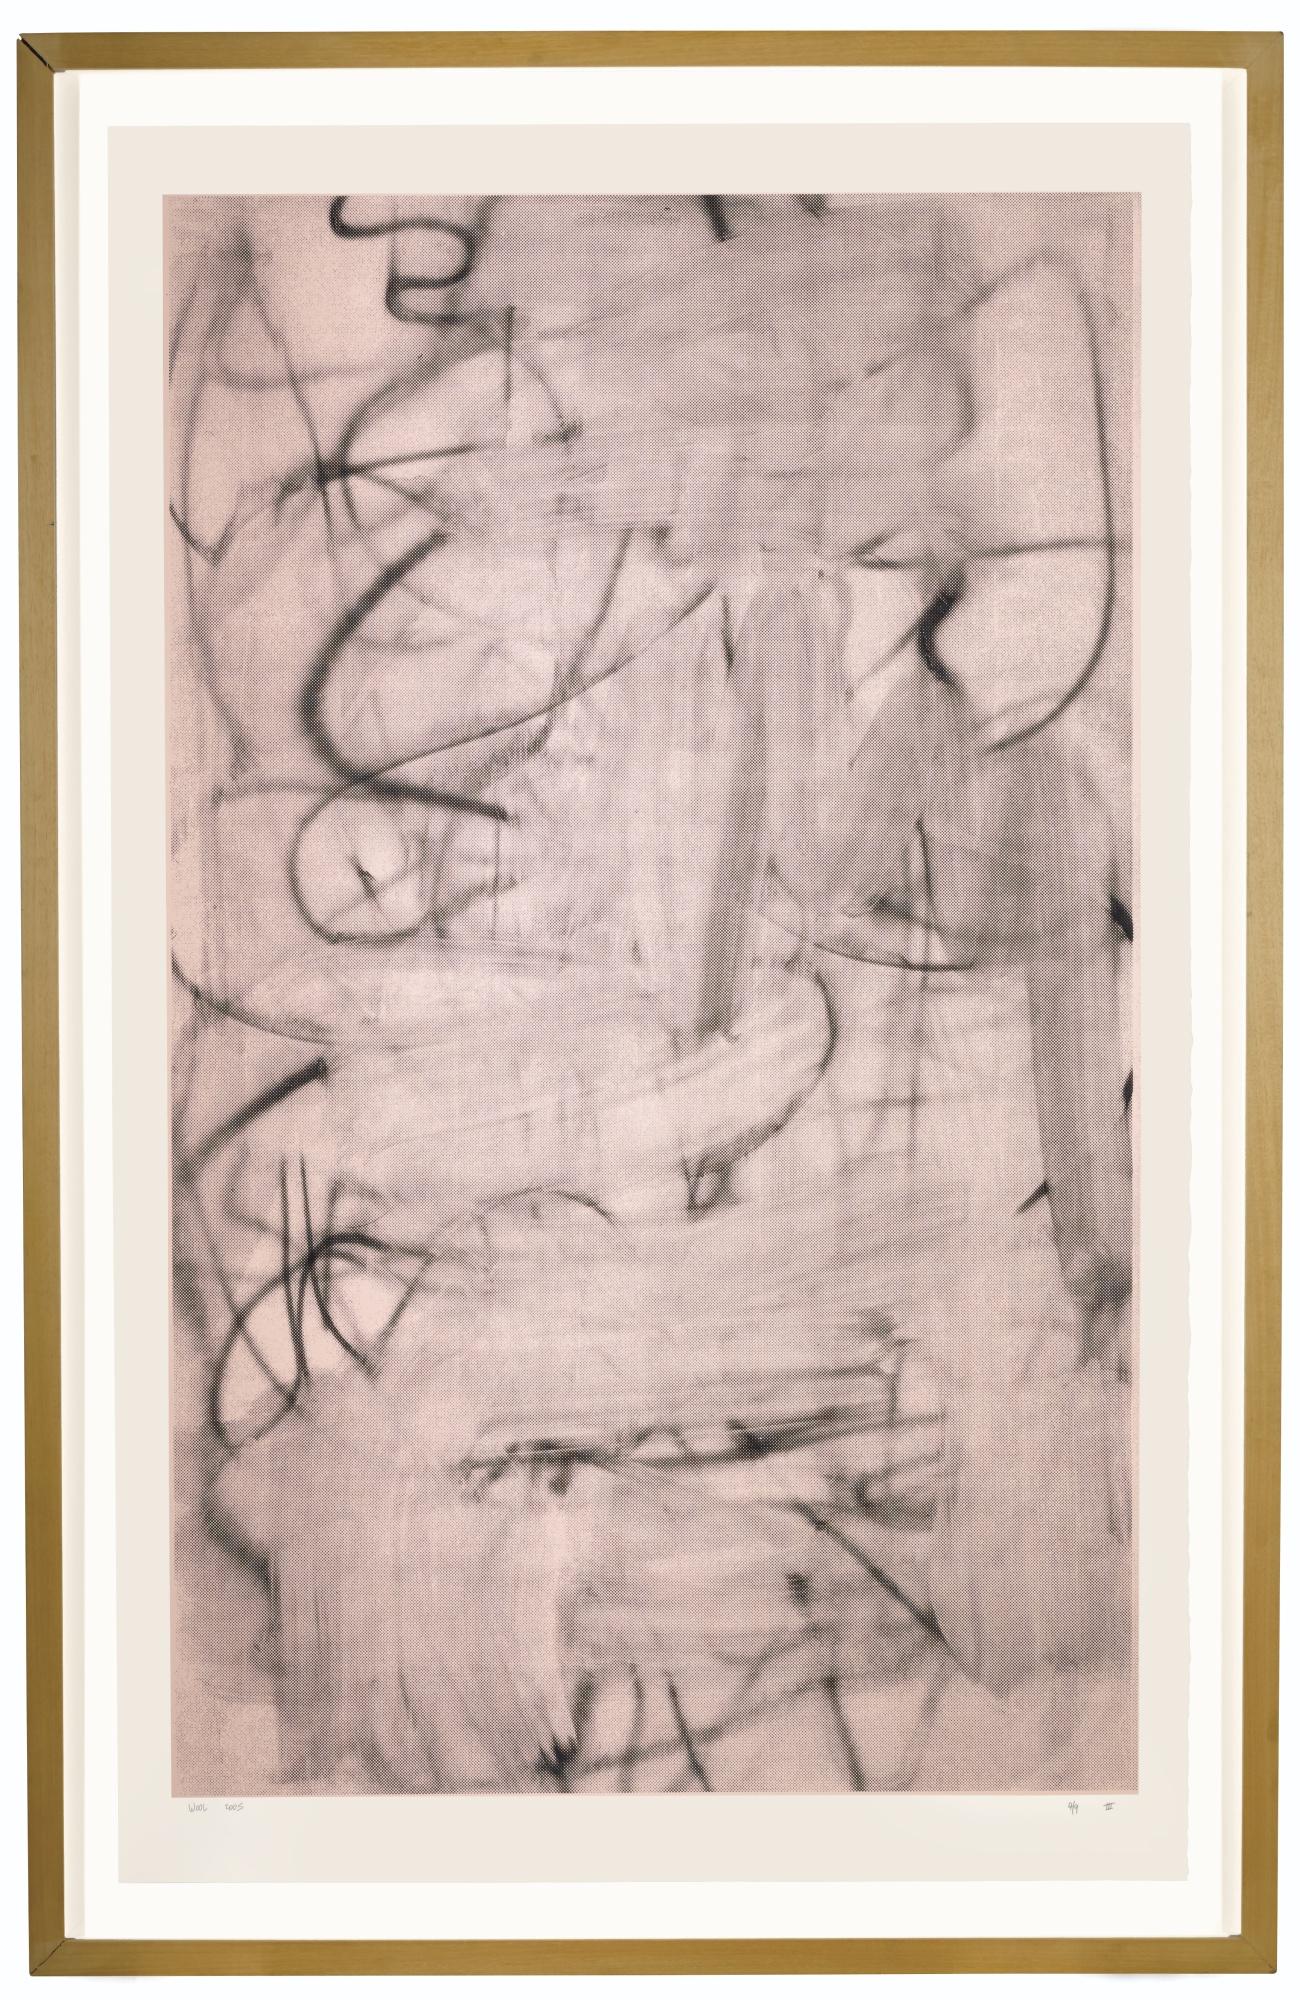 Christopher Wool-Three Women, Print 1-2005